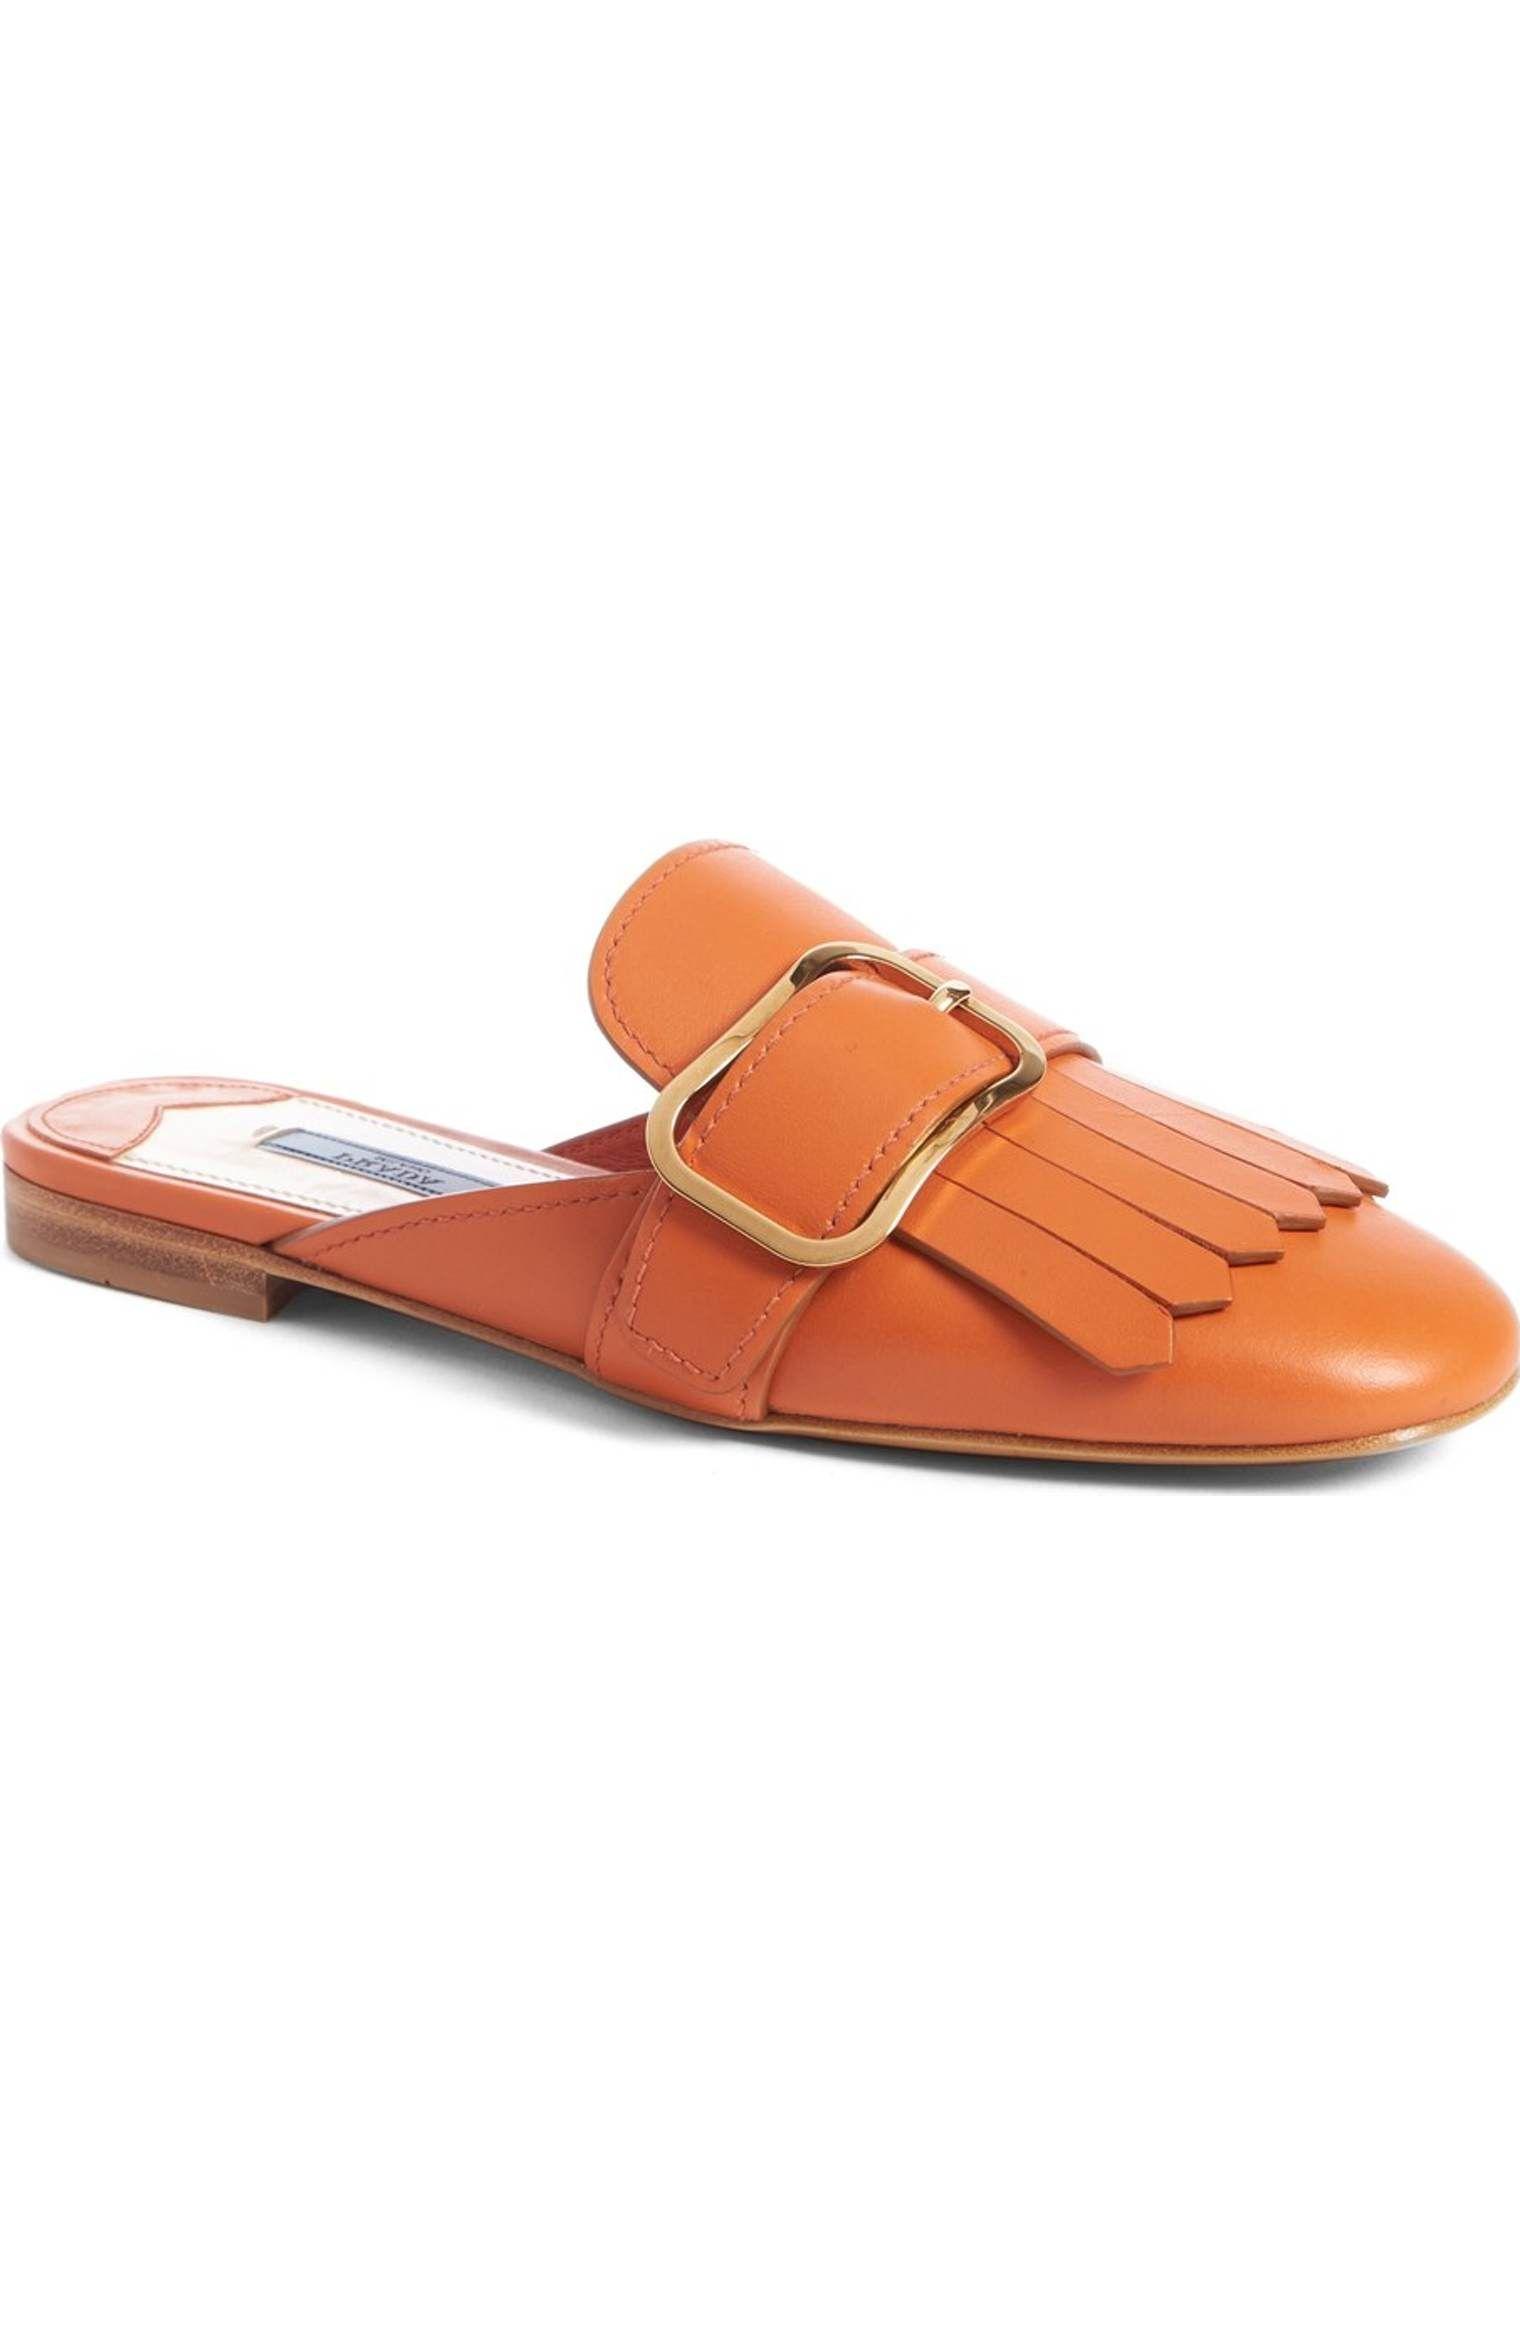 Women's Buckle Strap Flat Loafer Slide Sandal